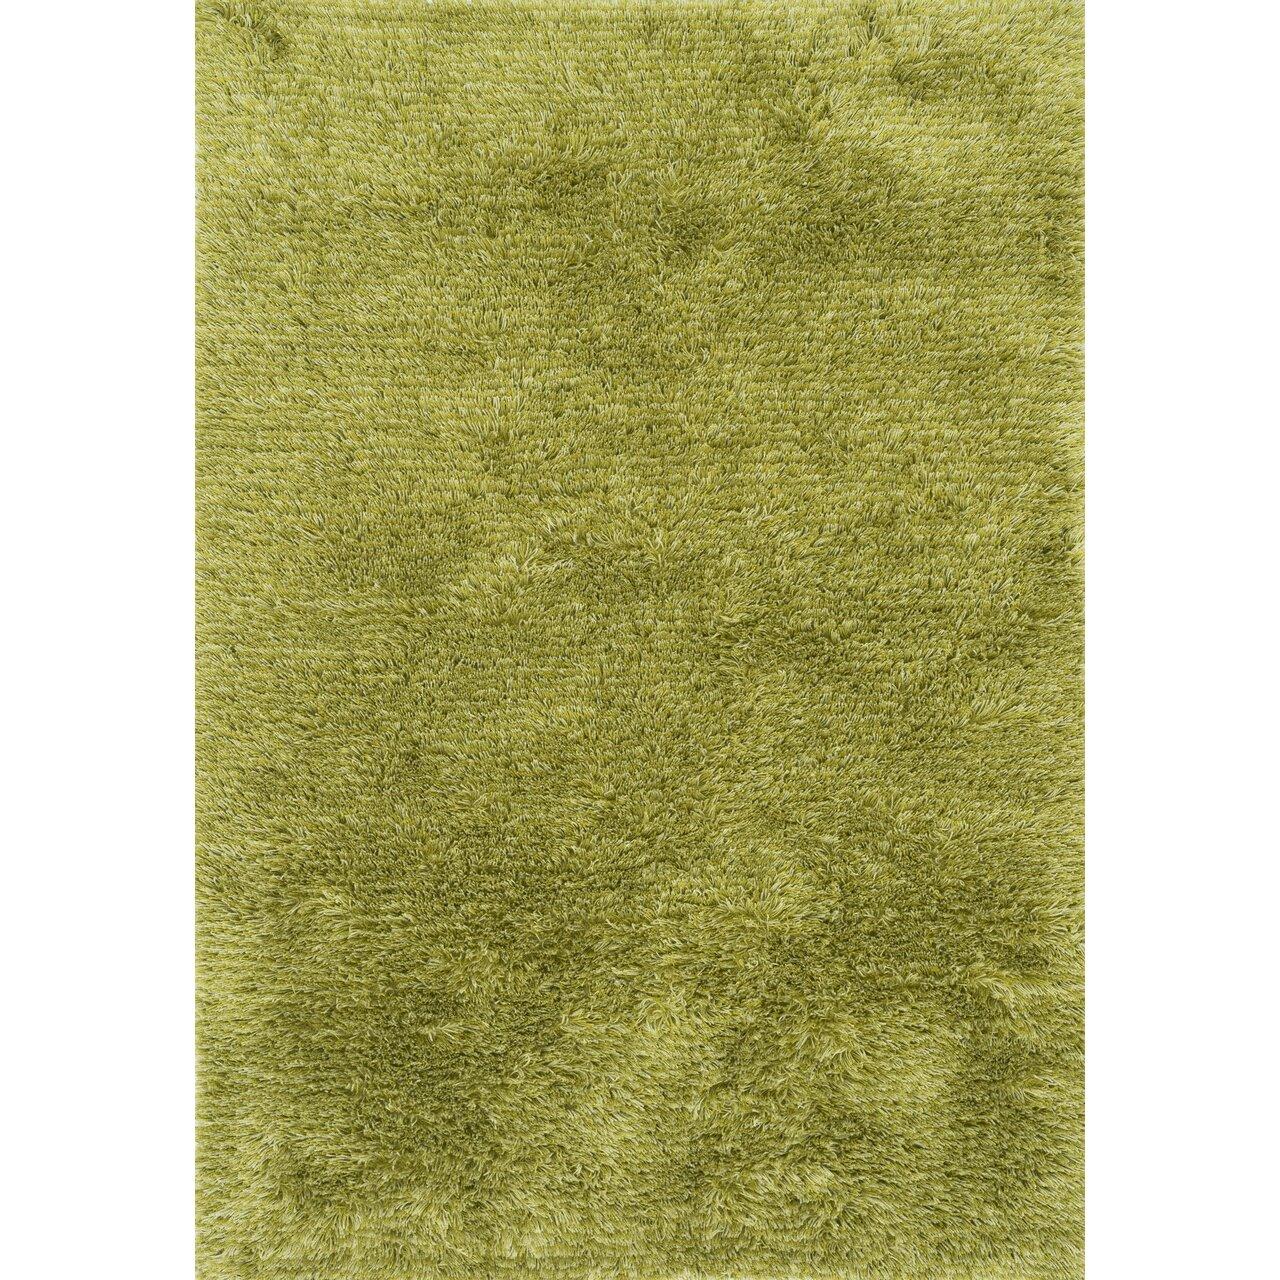 Loloi rugs garden shag green solid lawn indoor outdoor for Landscape indoor area rug